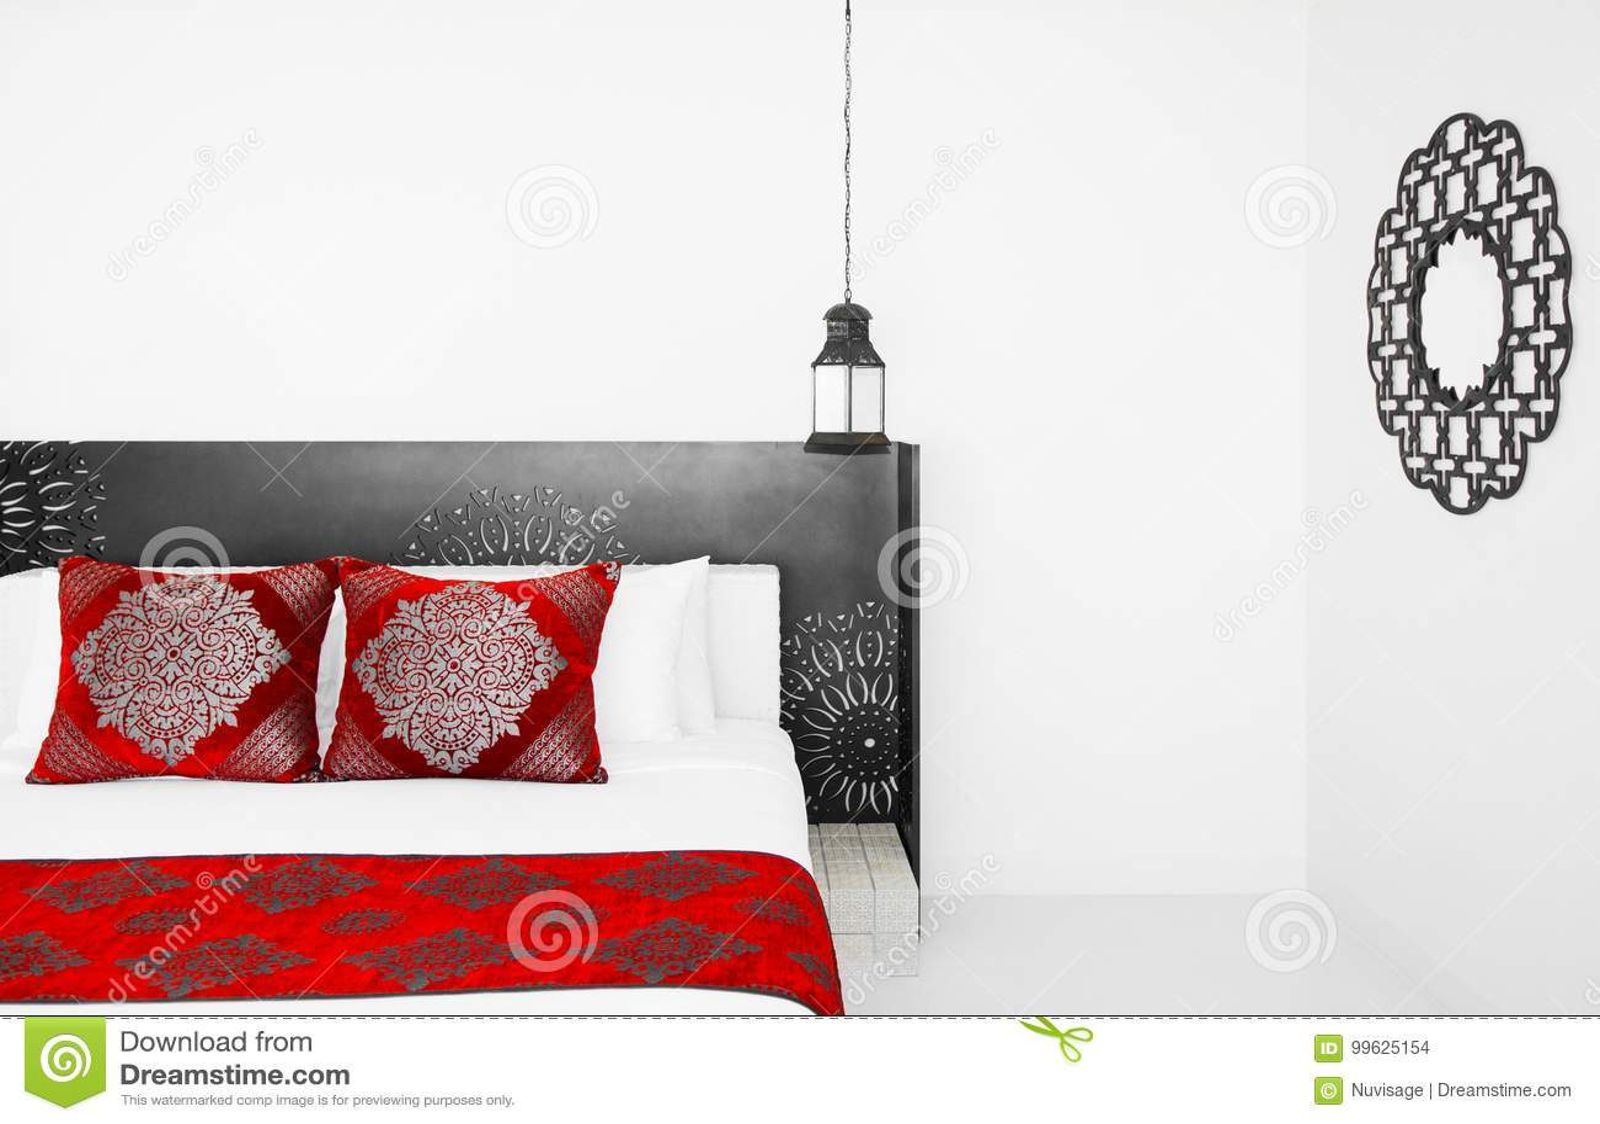 Moroccan Style Bedroom, Moroccan Decoration Editorial Stock ...